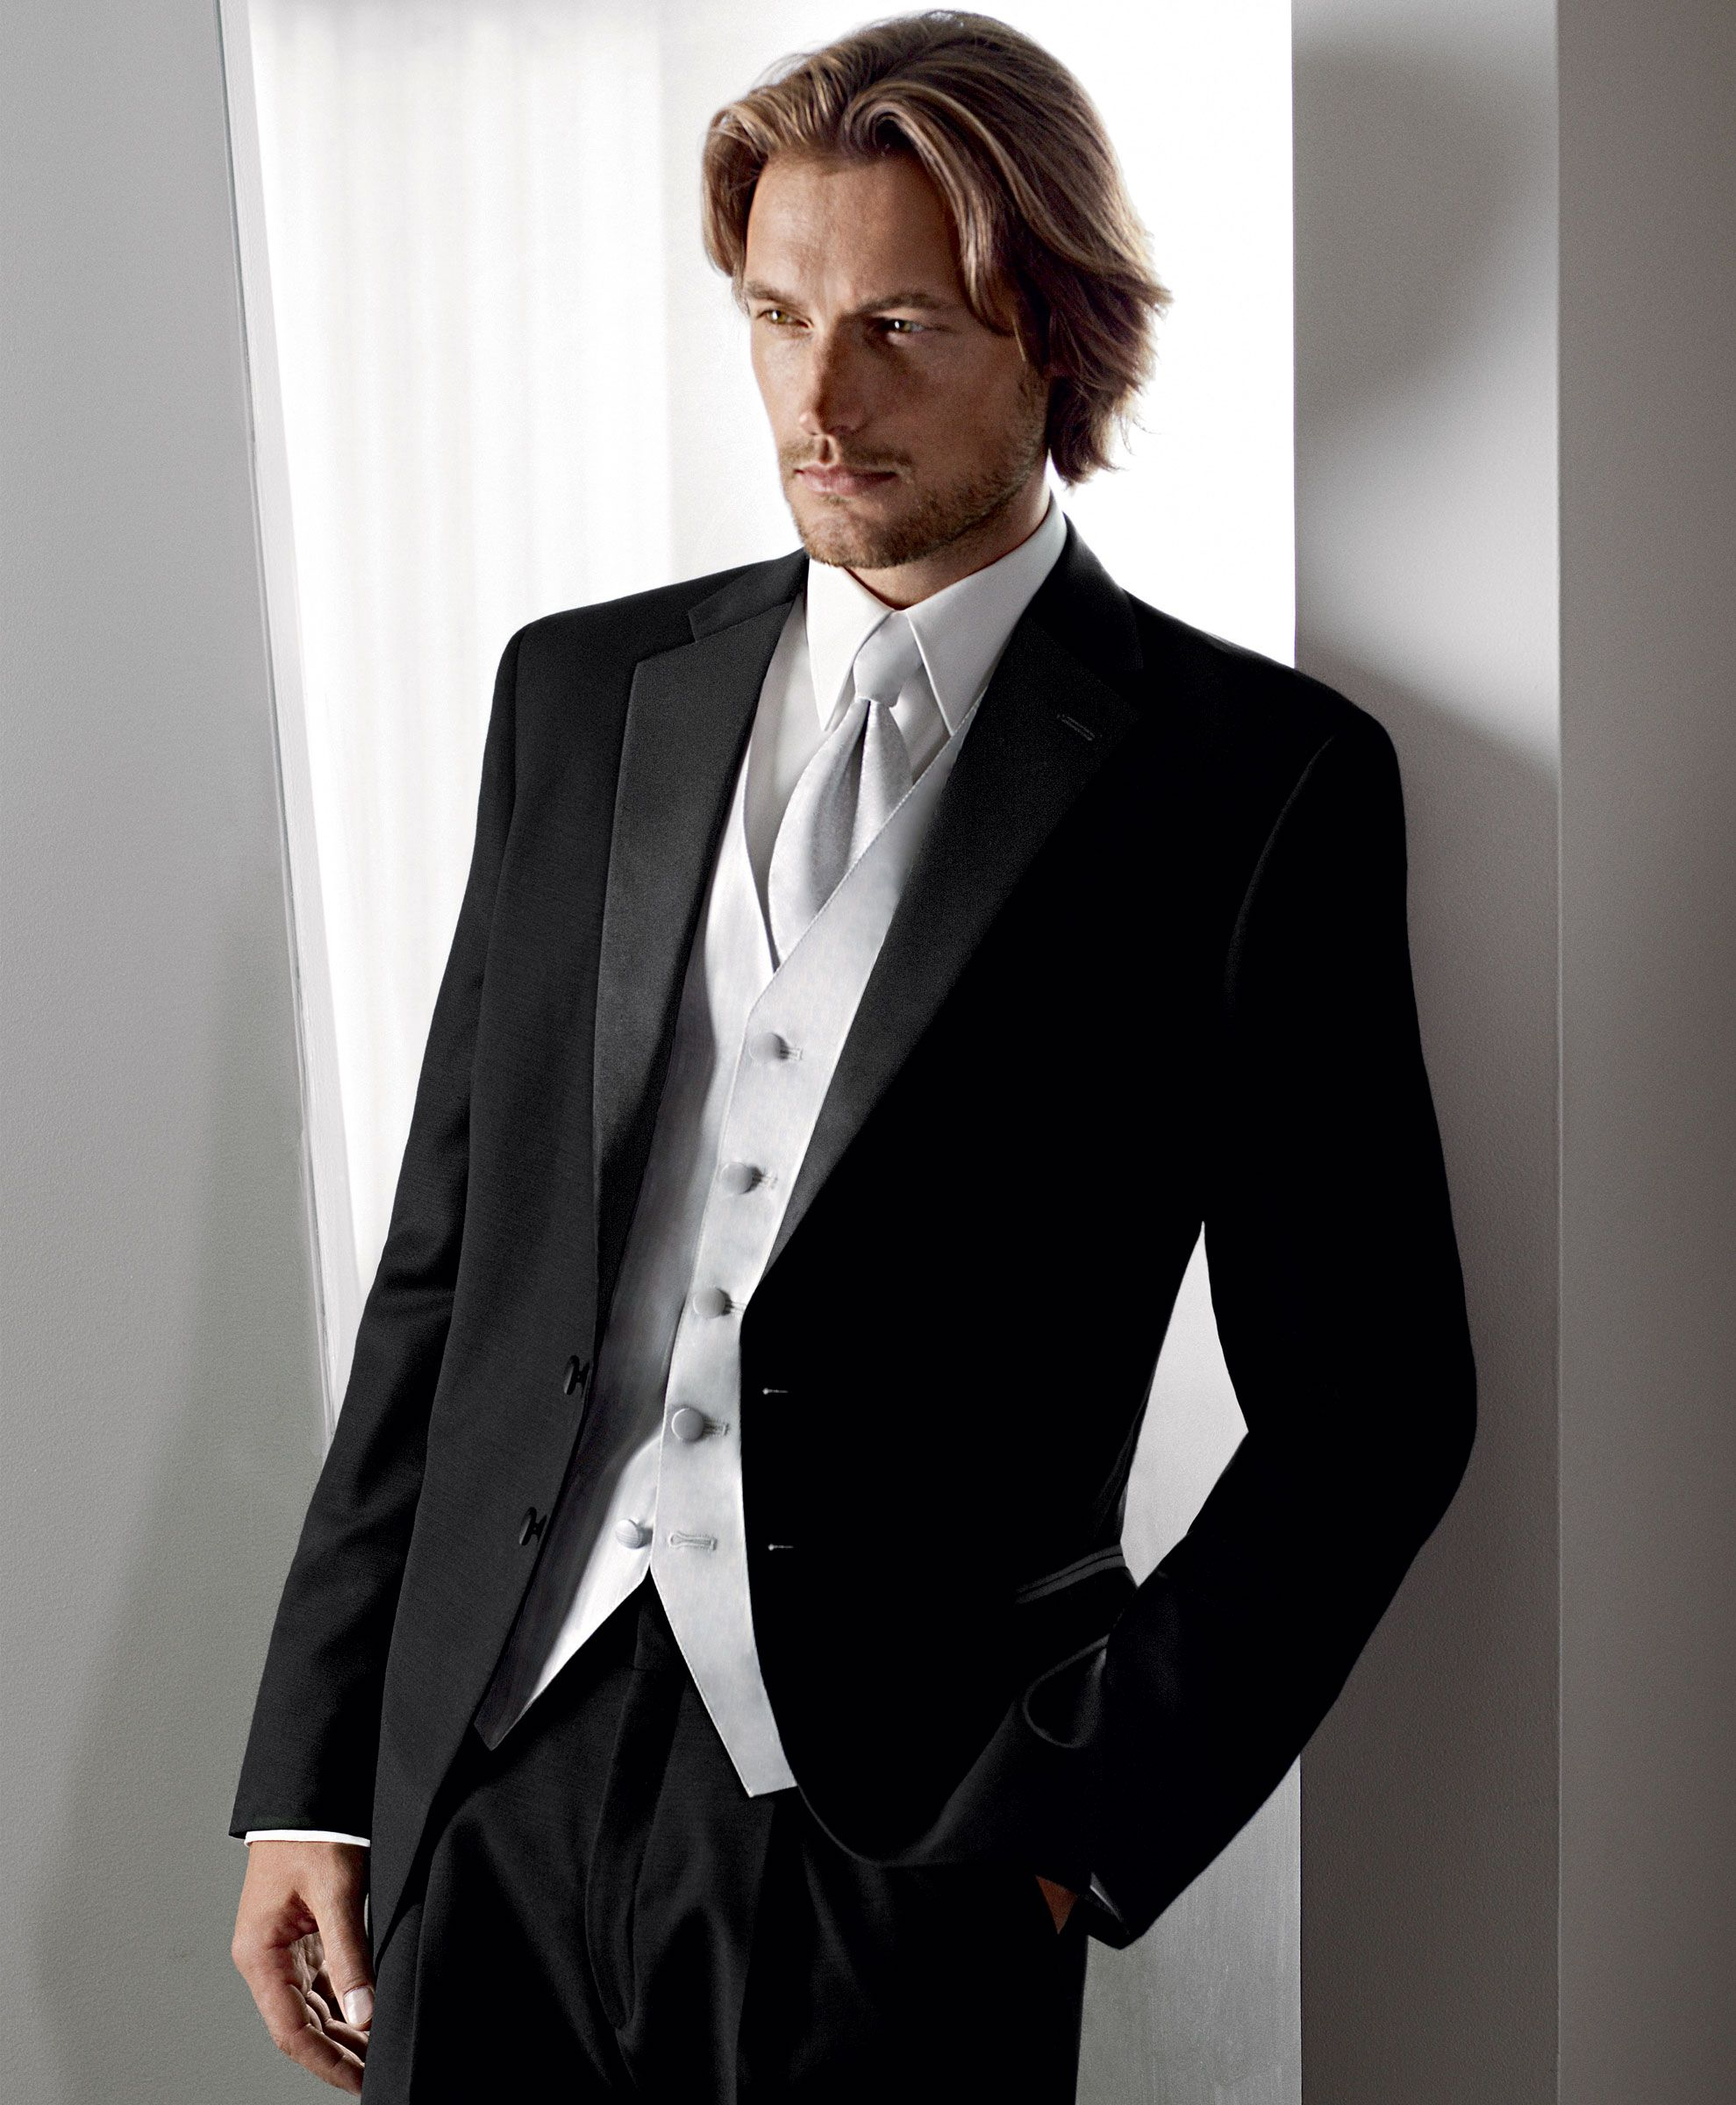 Tuxedos For Weddings